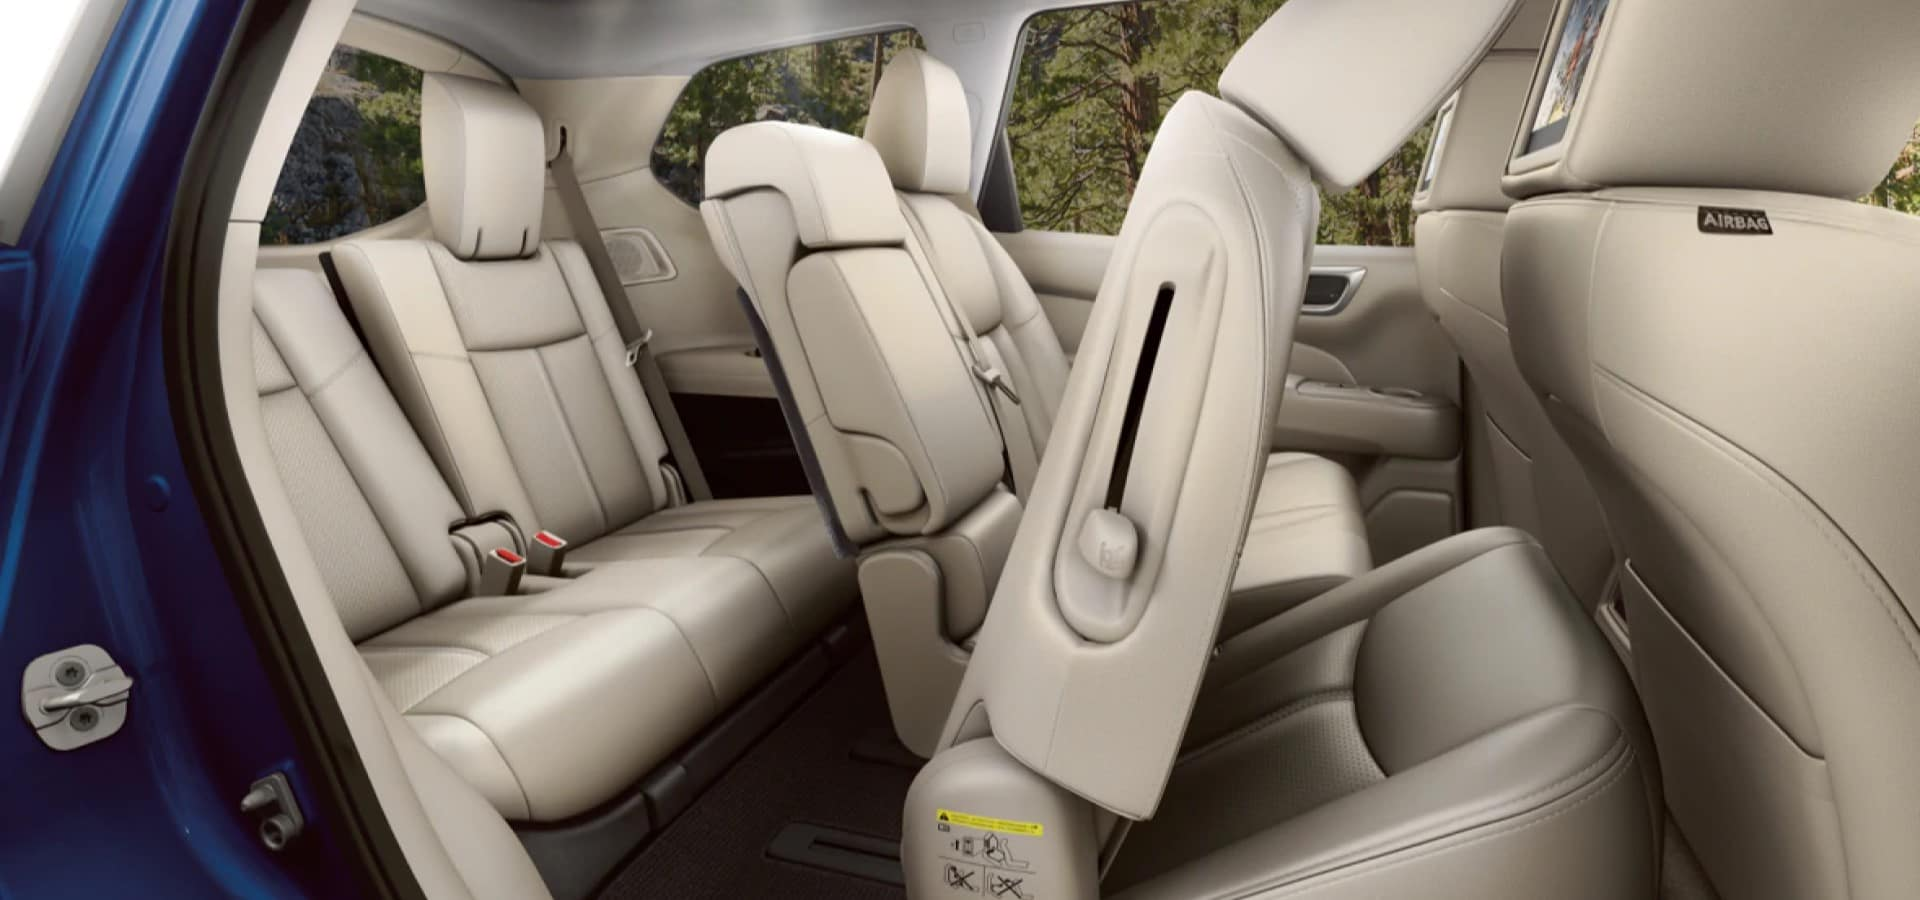 Nissan_Pathfinder_Interior_Rear_Seats